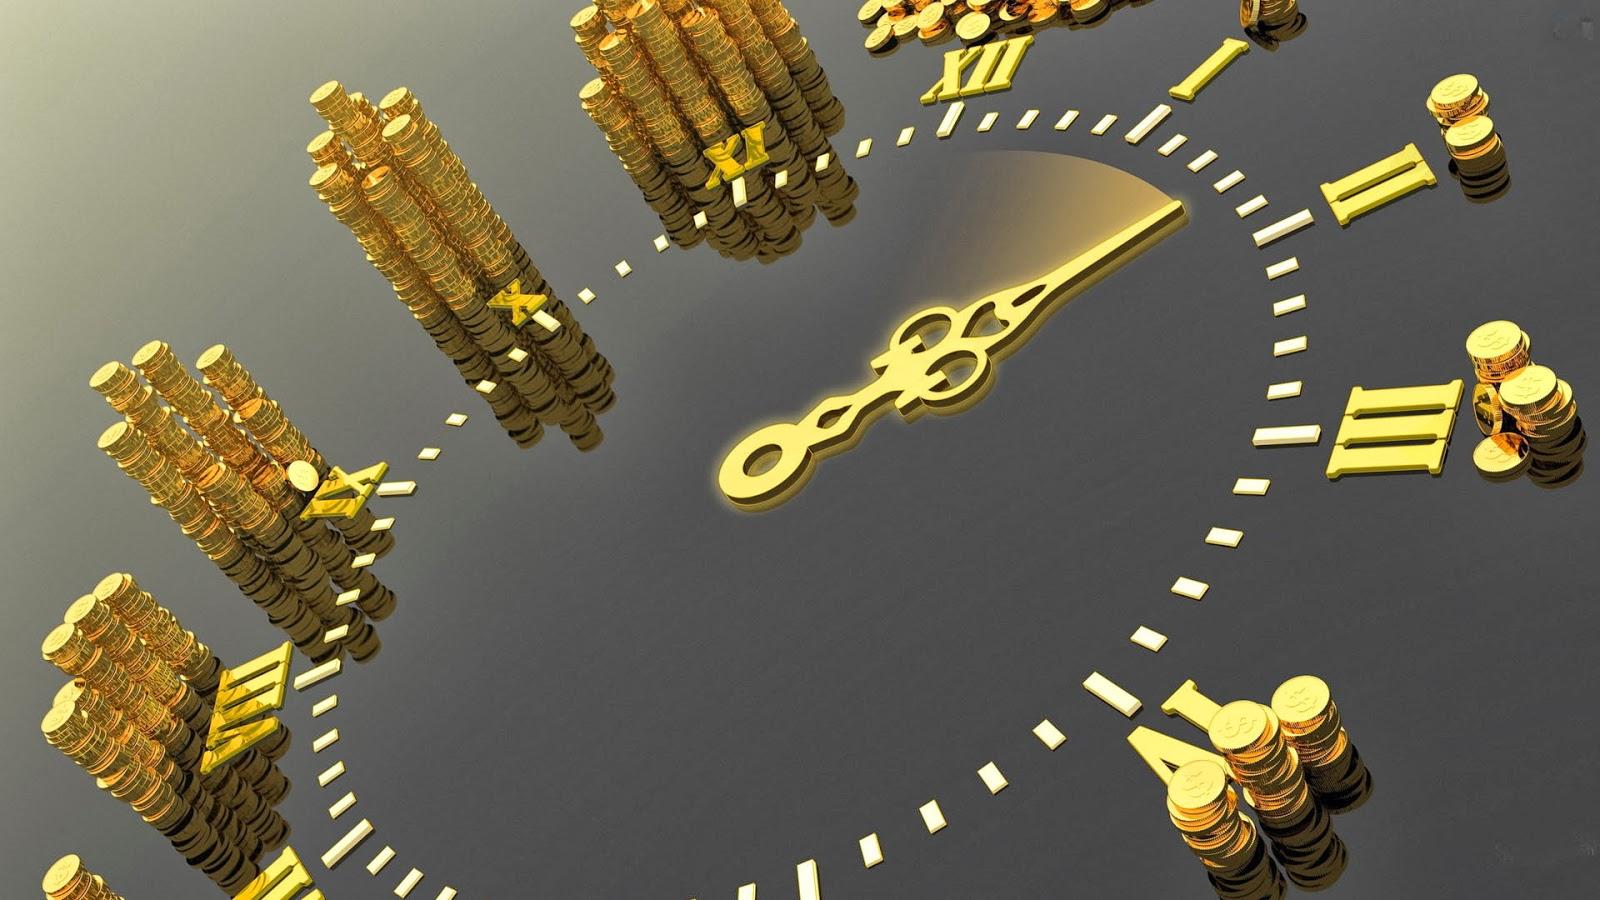 3d watch golden look hd 1080p